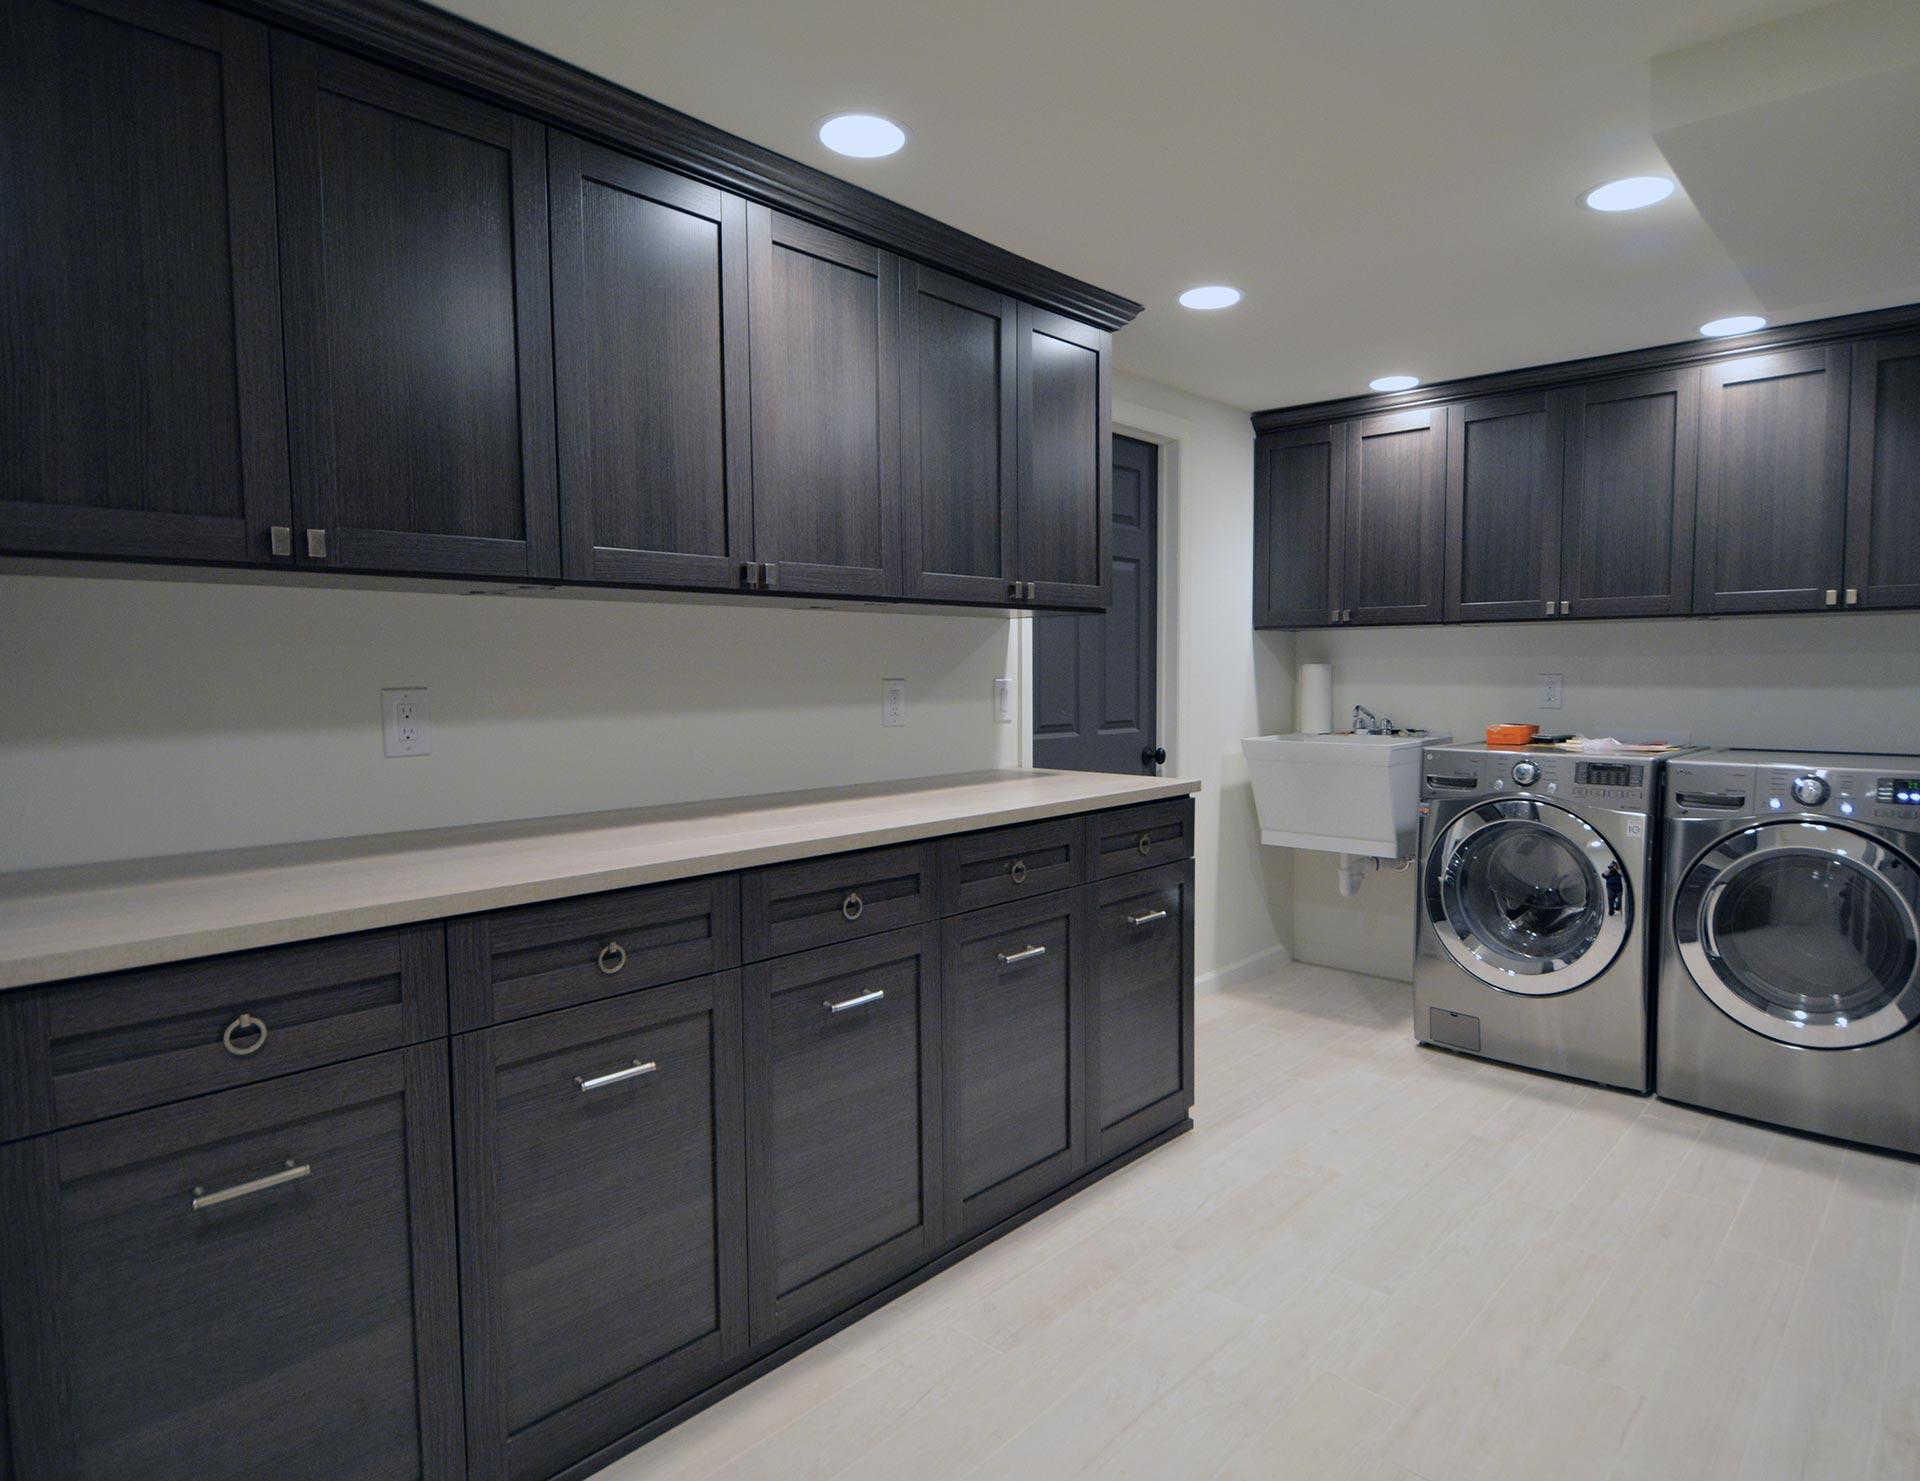 Laundry Room Cabinets & Storage Ideas | California Closets on Laundry Room Cabinets  id=14138